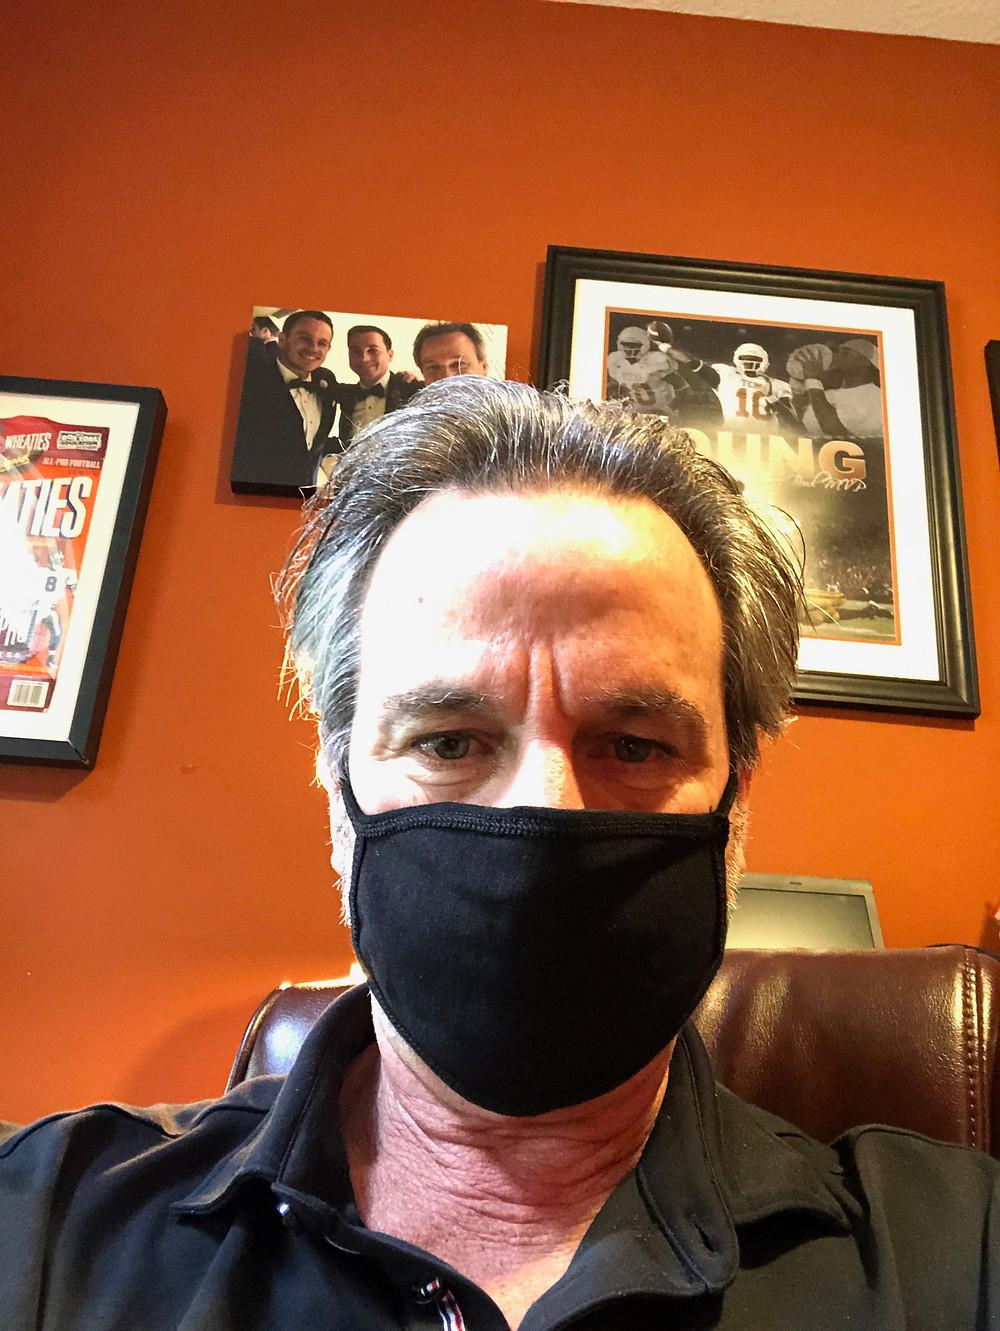 Empty Nesters Finally Brad models his mask for #quarantine